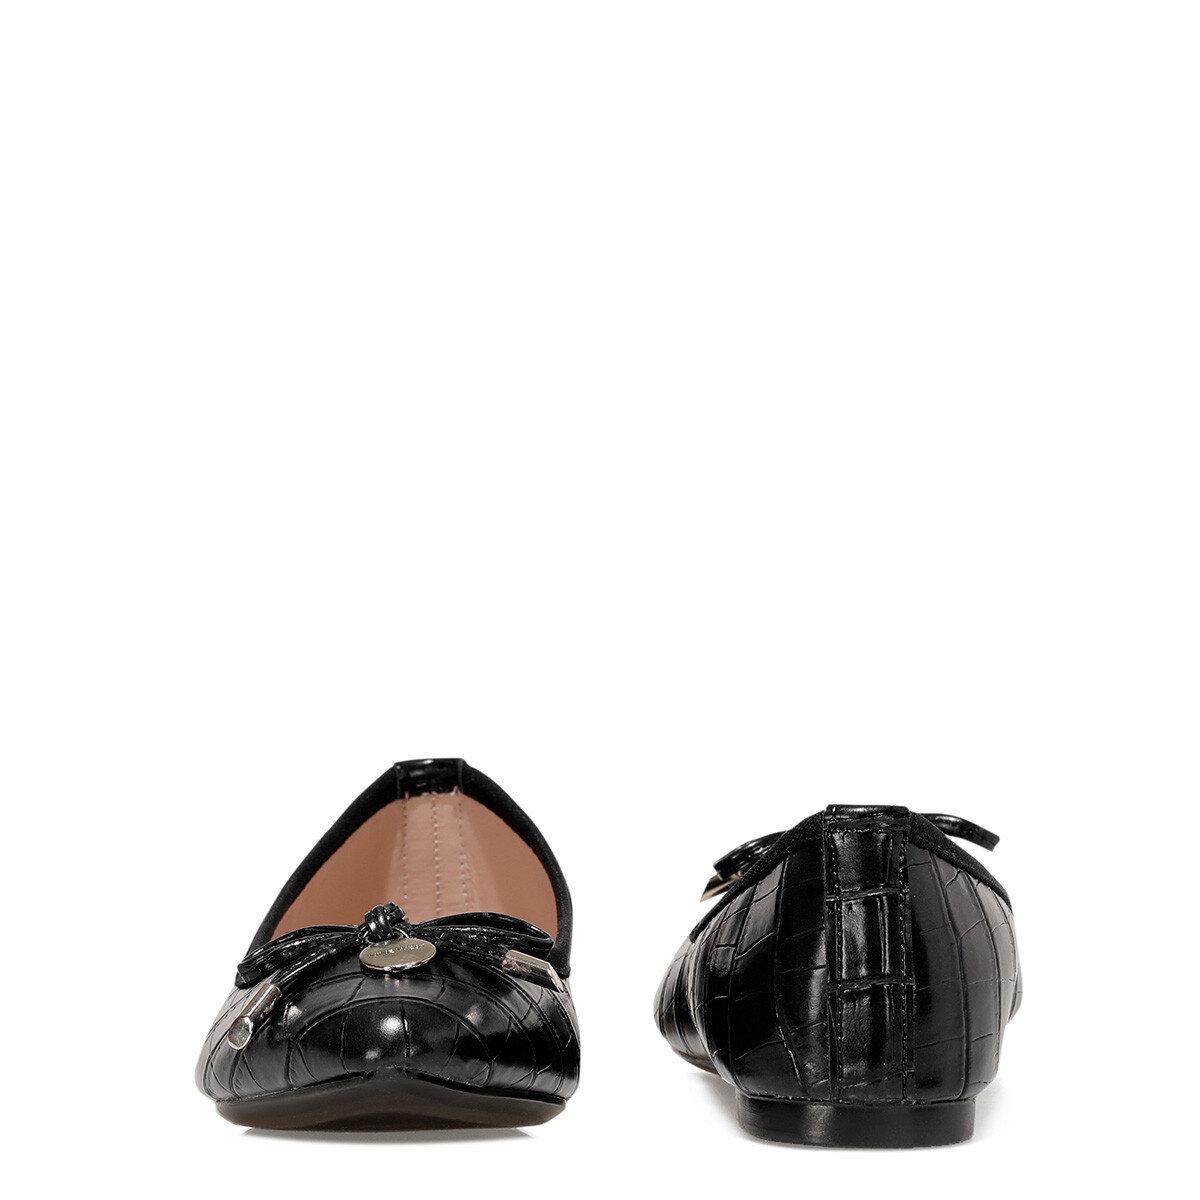 NARNY Siyah Kadın Babet